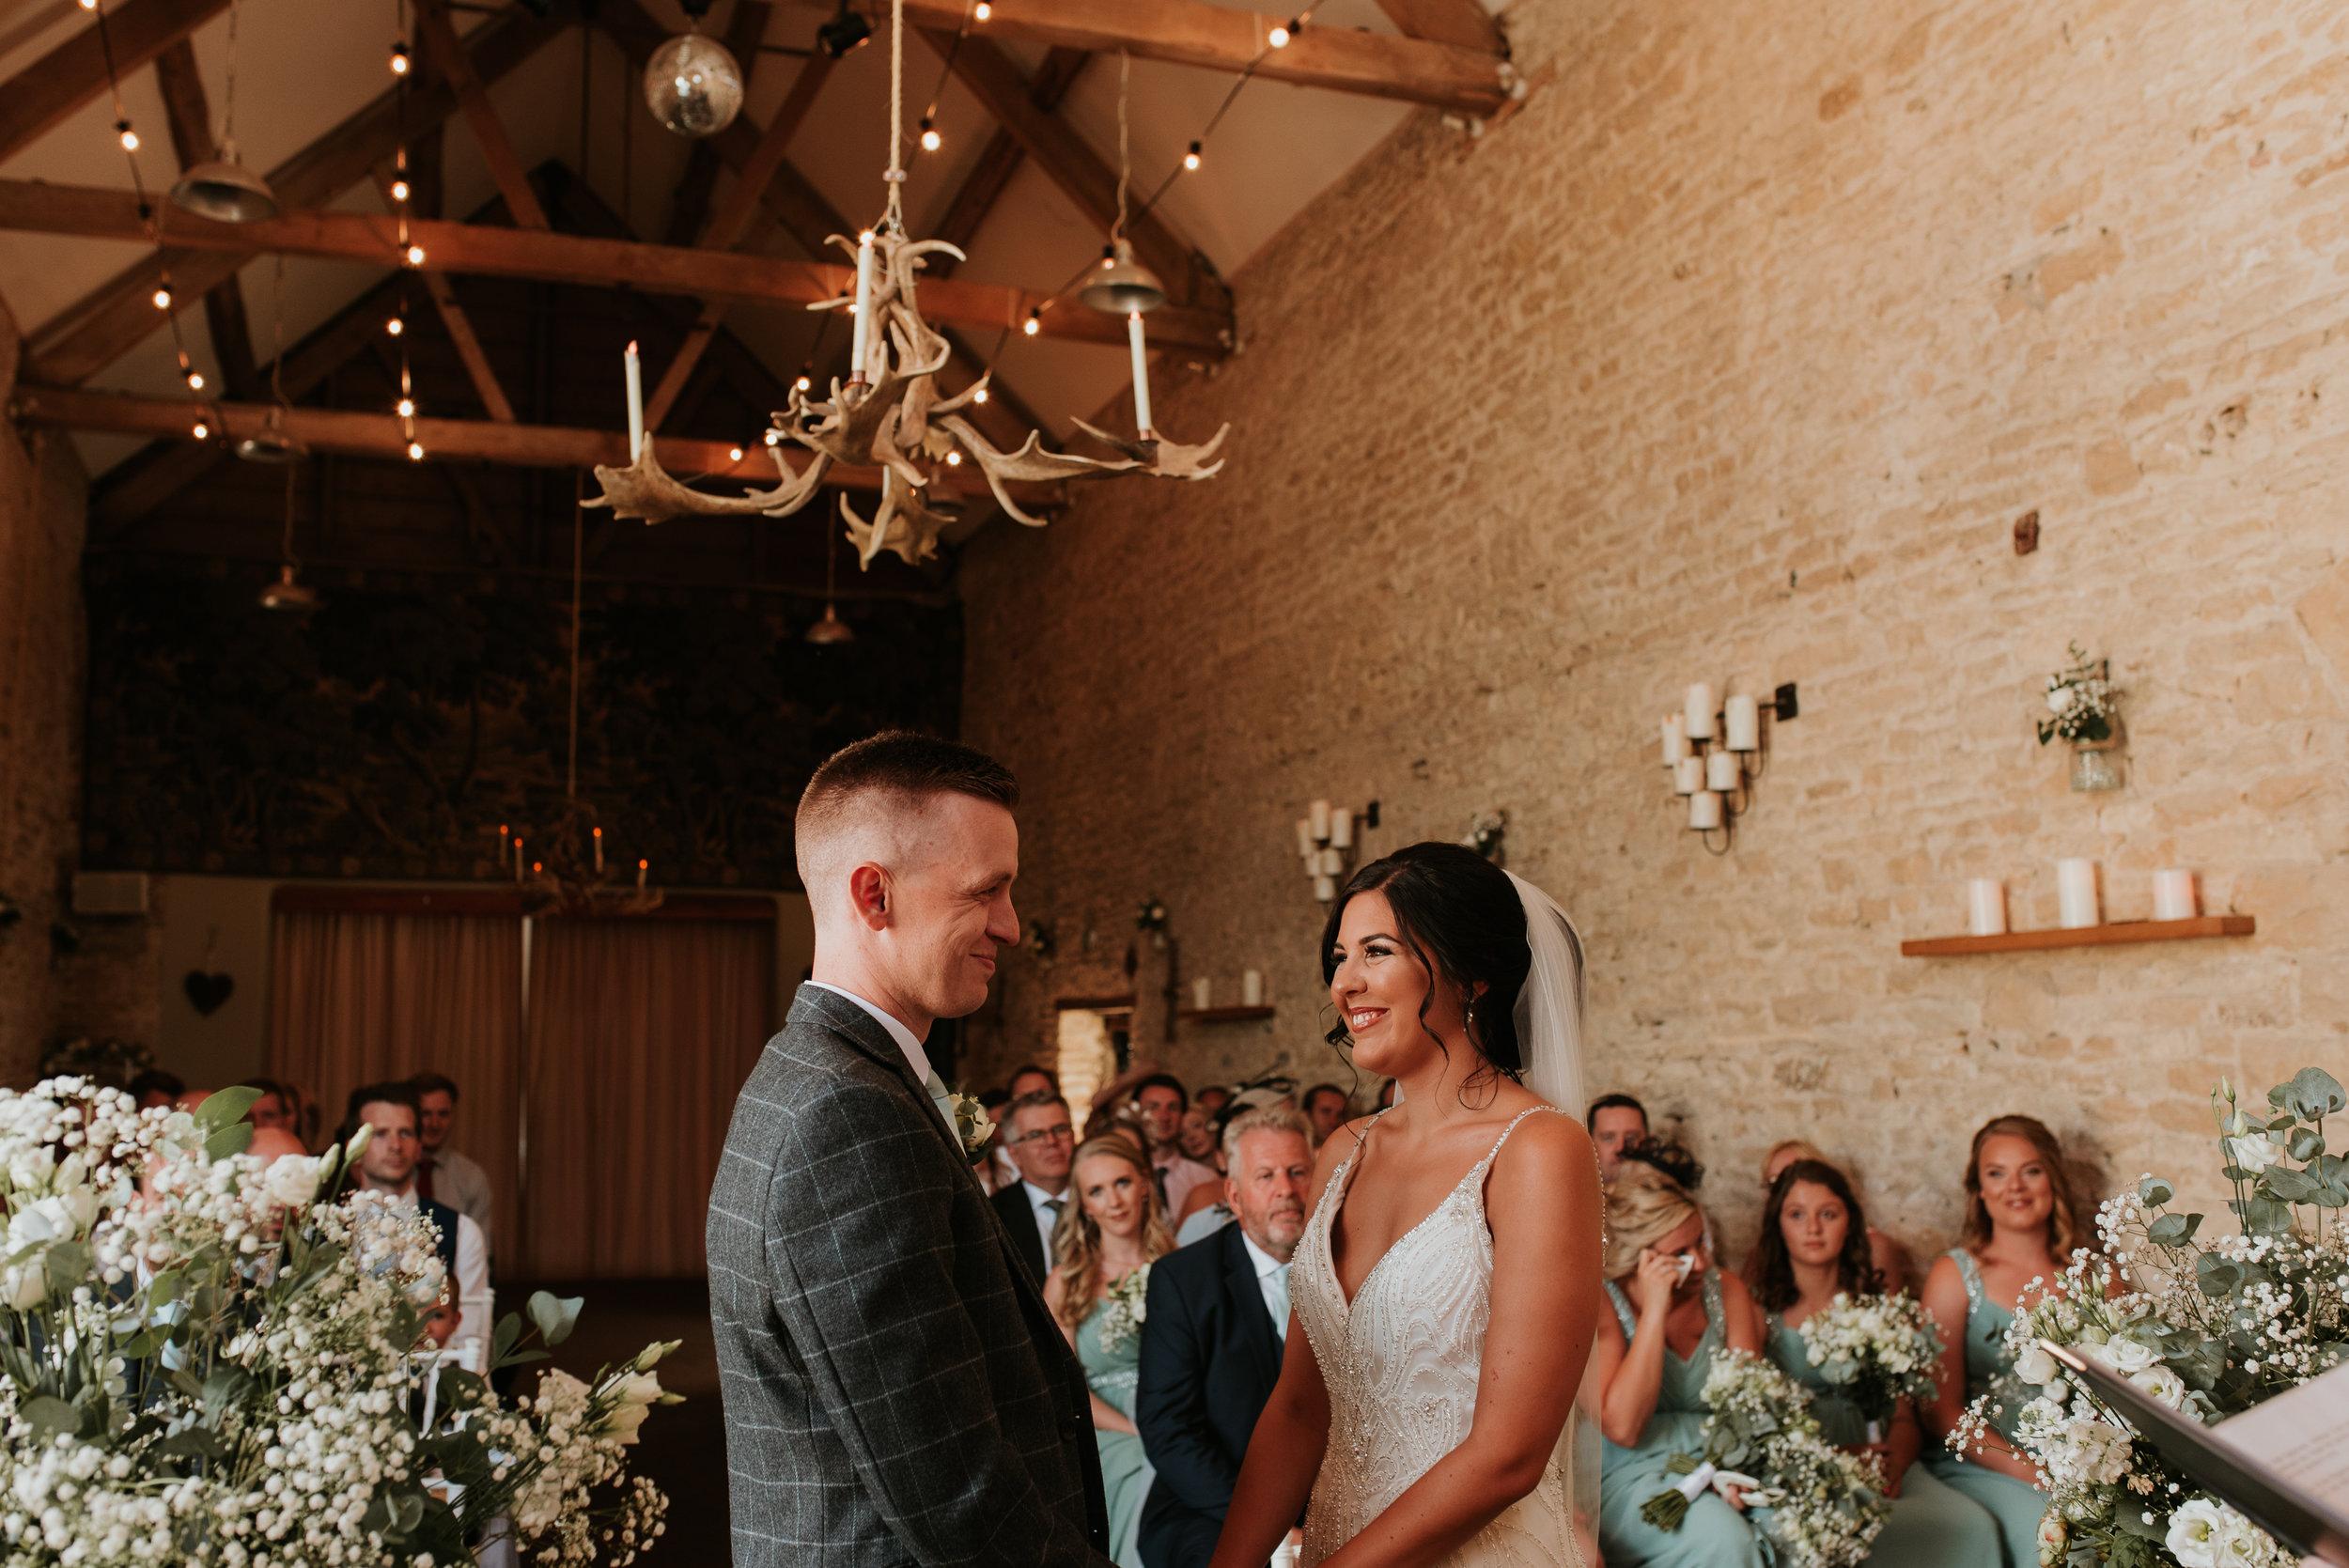 Oxfordshire-wedding-photographer-37.jpg